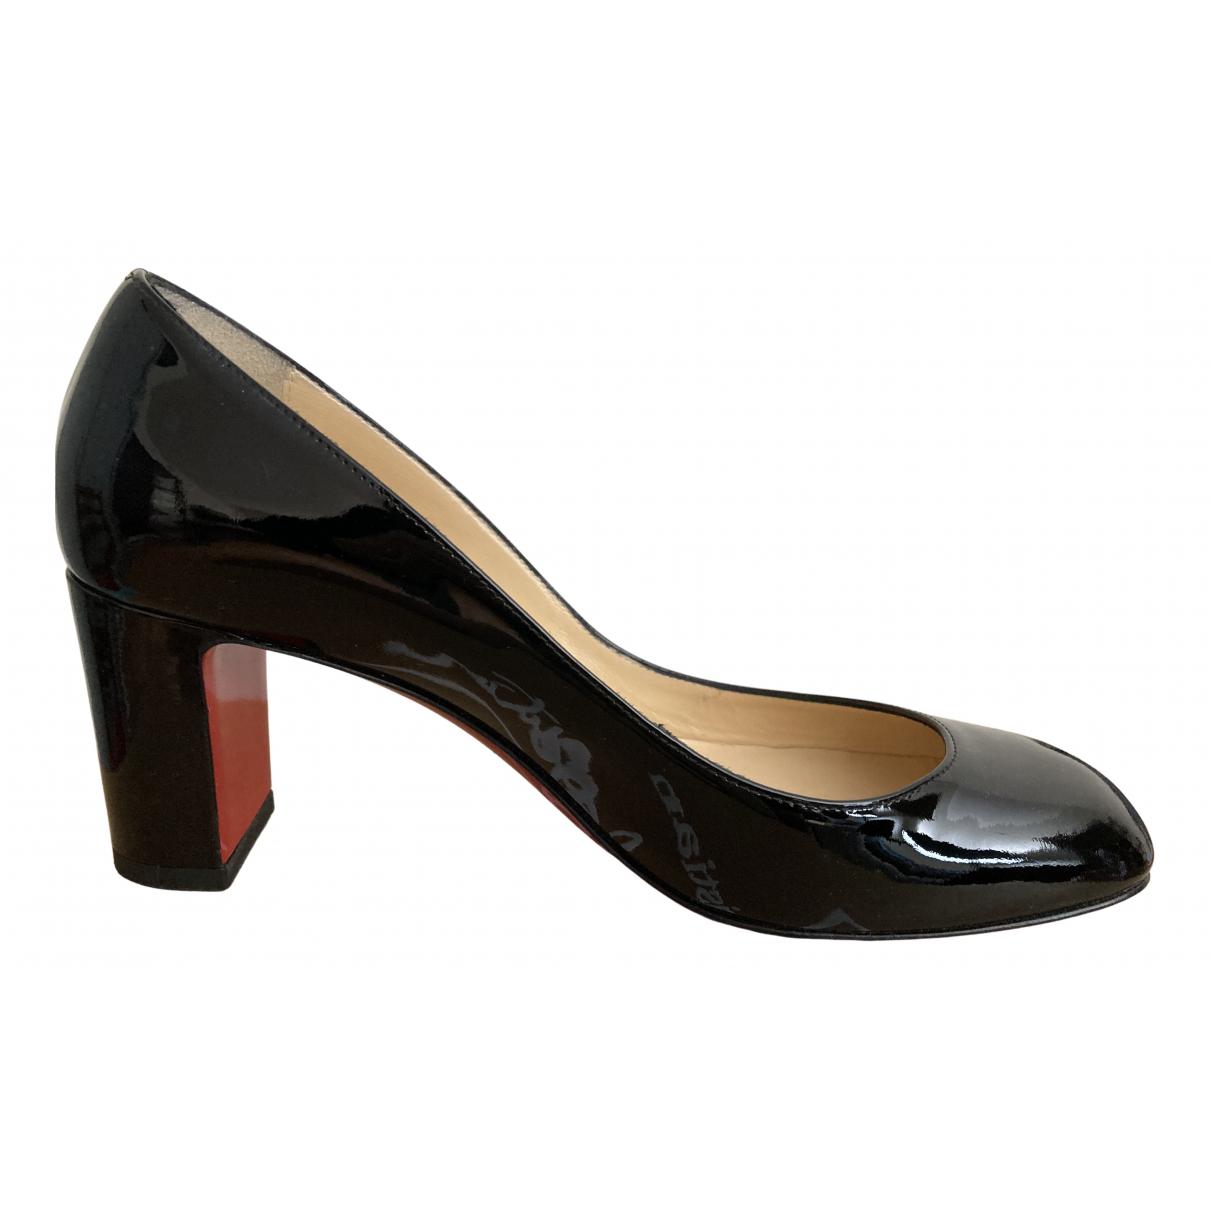 Christian Louboutin N Black Patent leather Heels for Women 36.5 EU